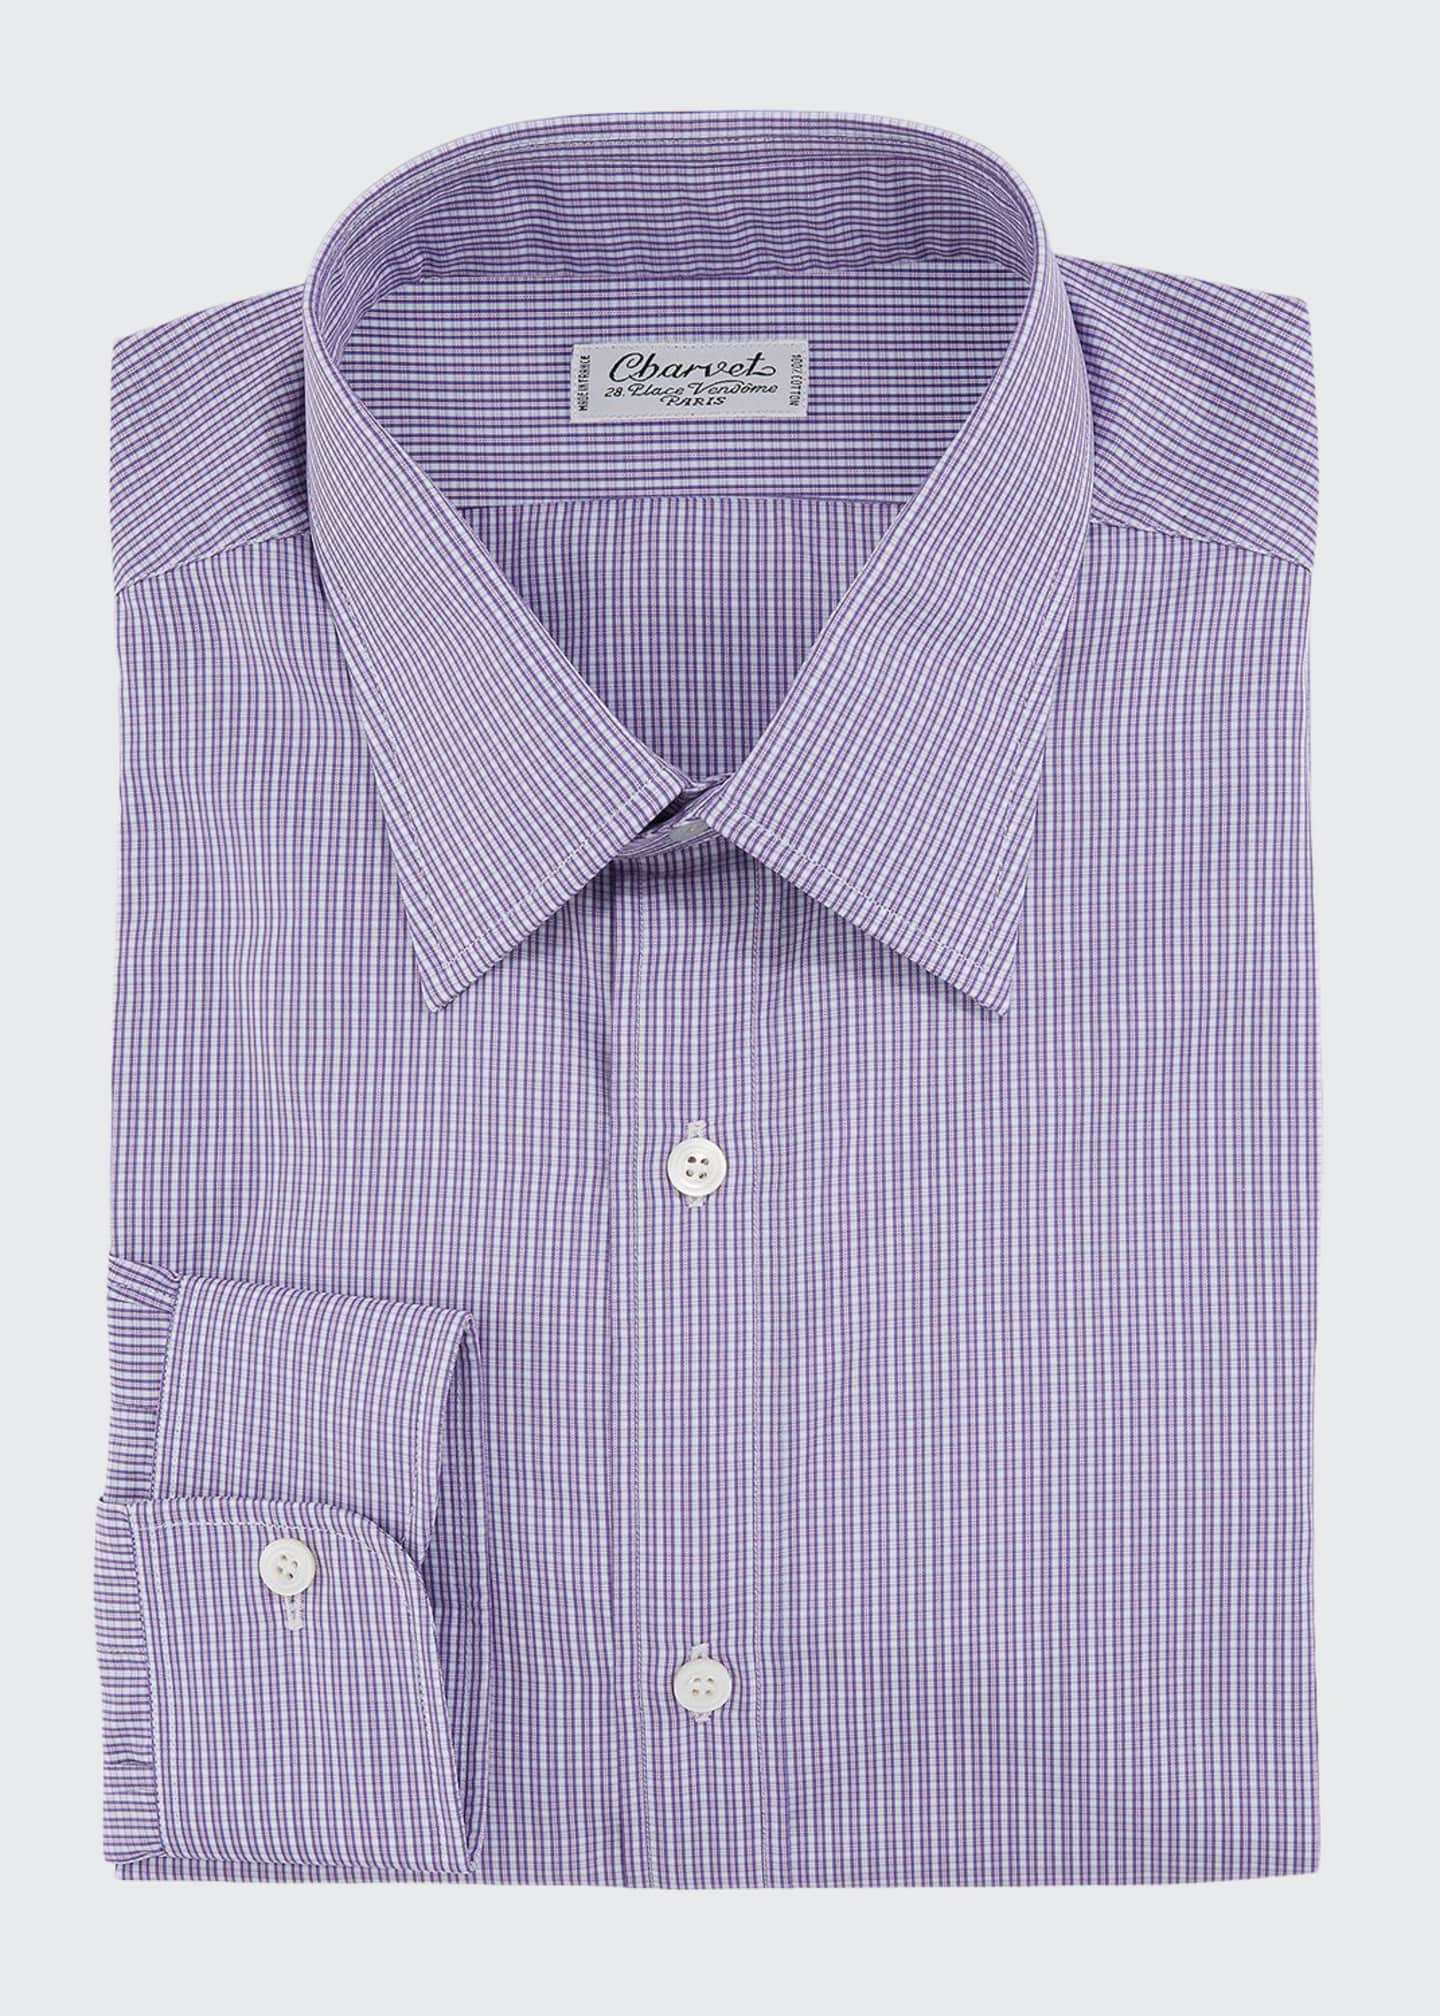 Charvet Men's Checker Cotton Dress Shirt